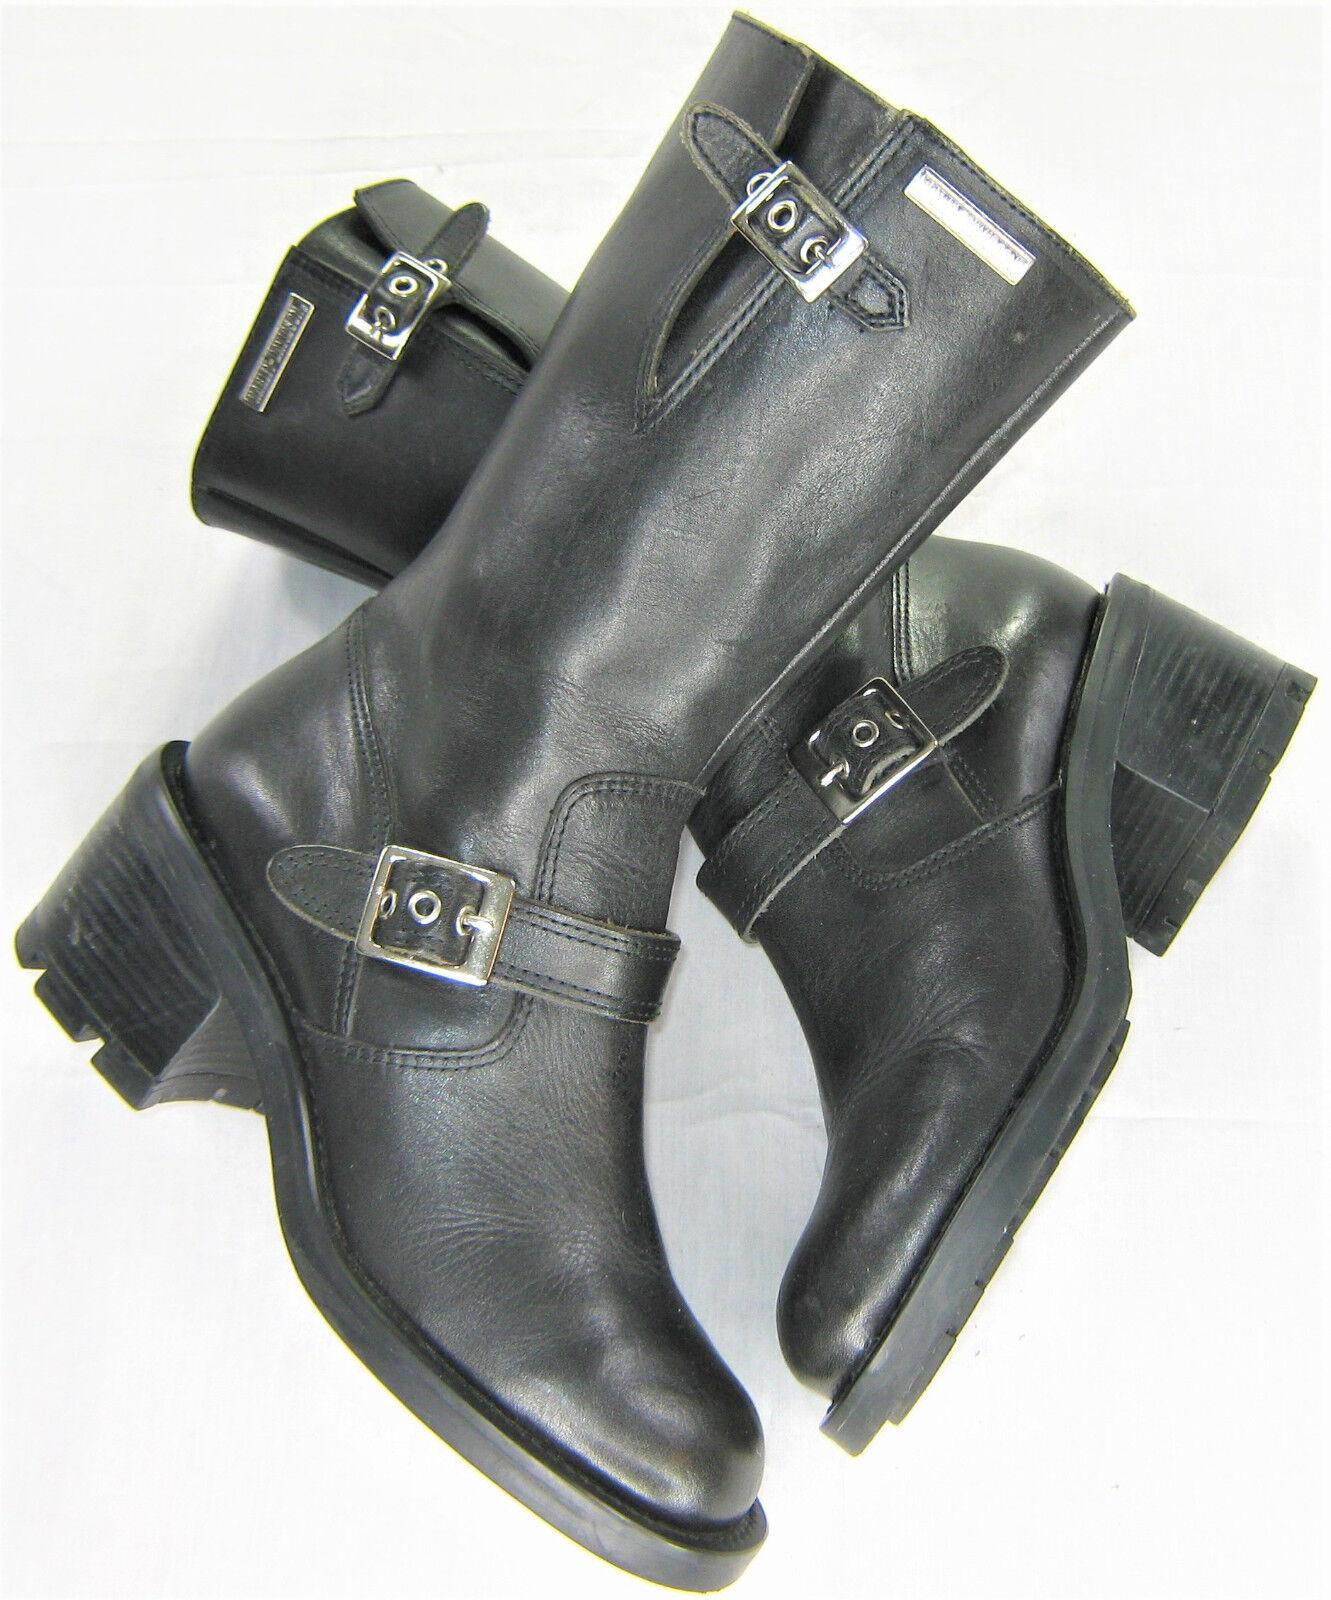 Damenschuhe harley davidson Leder Stiefel 6 schwarz zip up up up mid calf 2.5